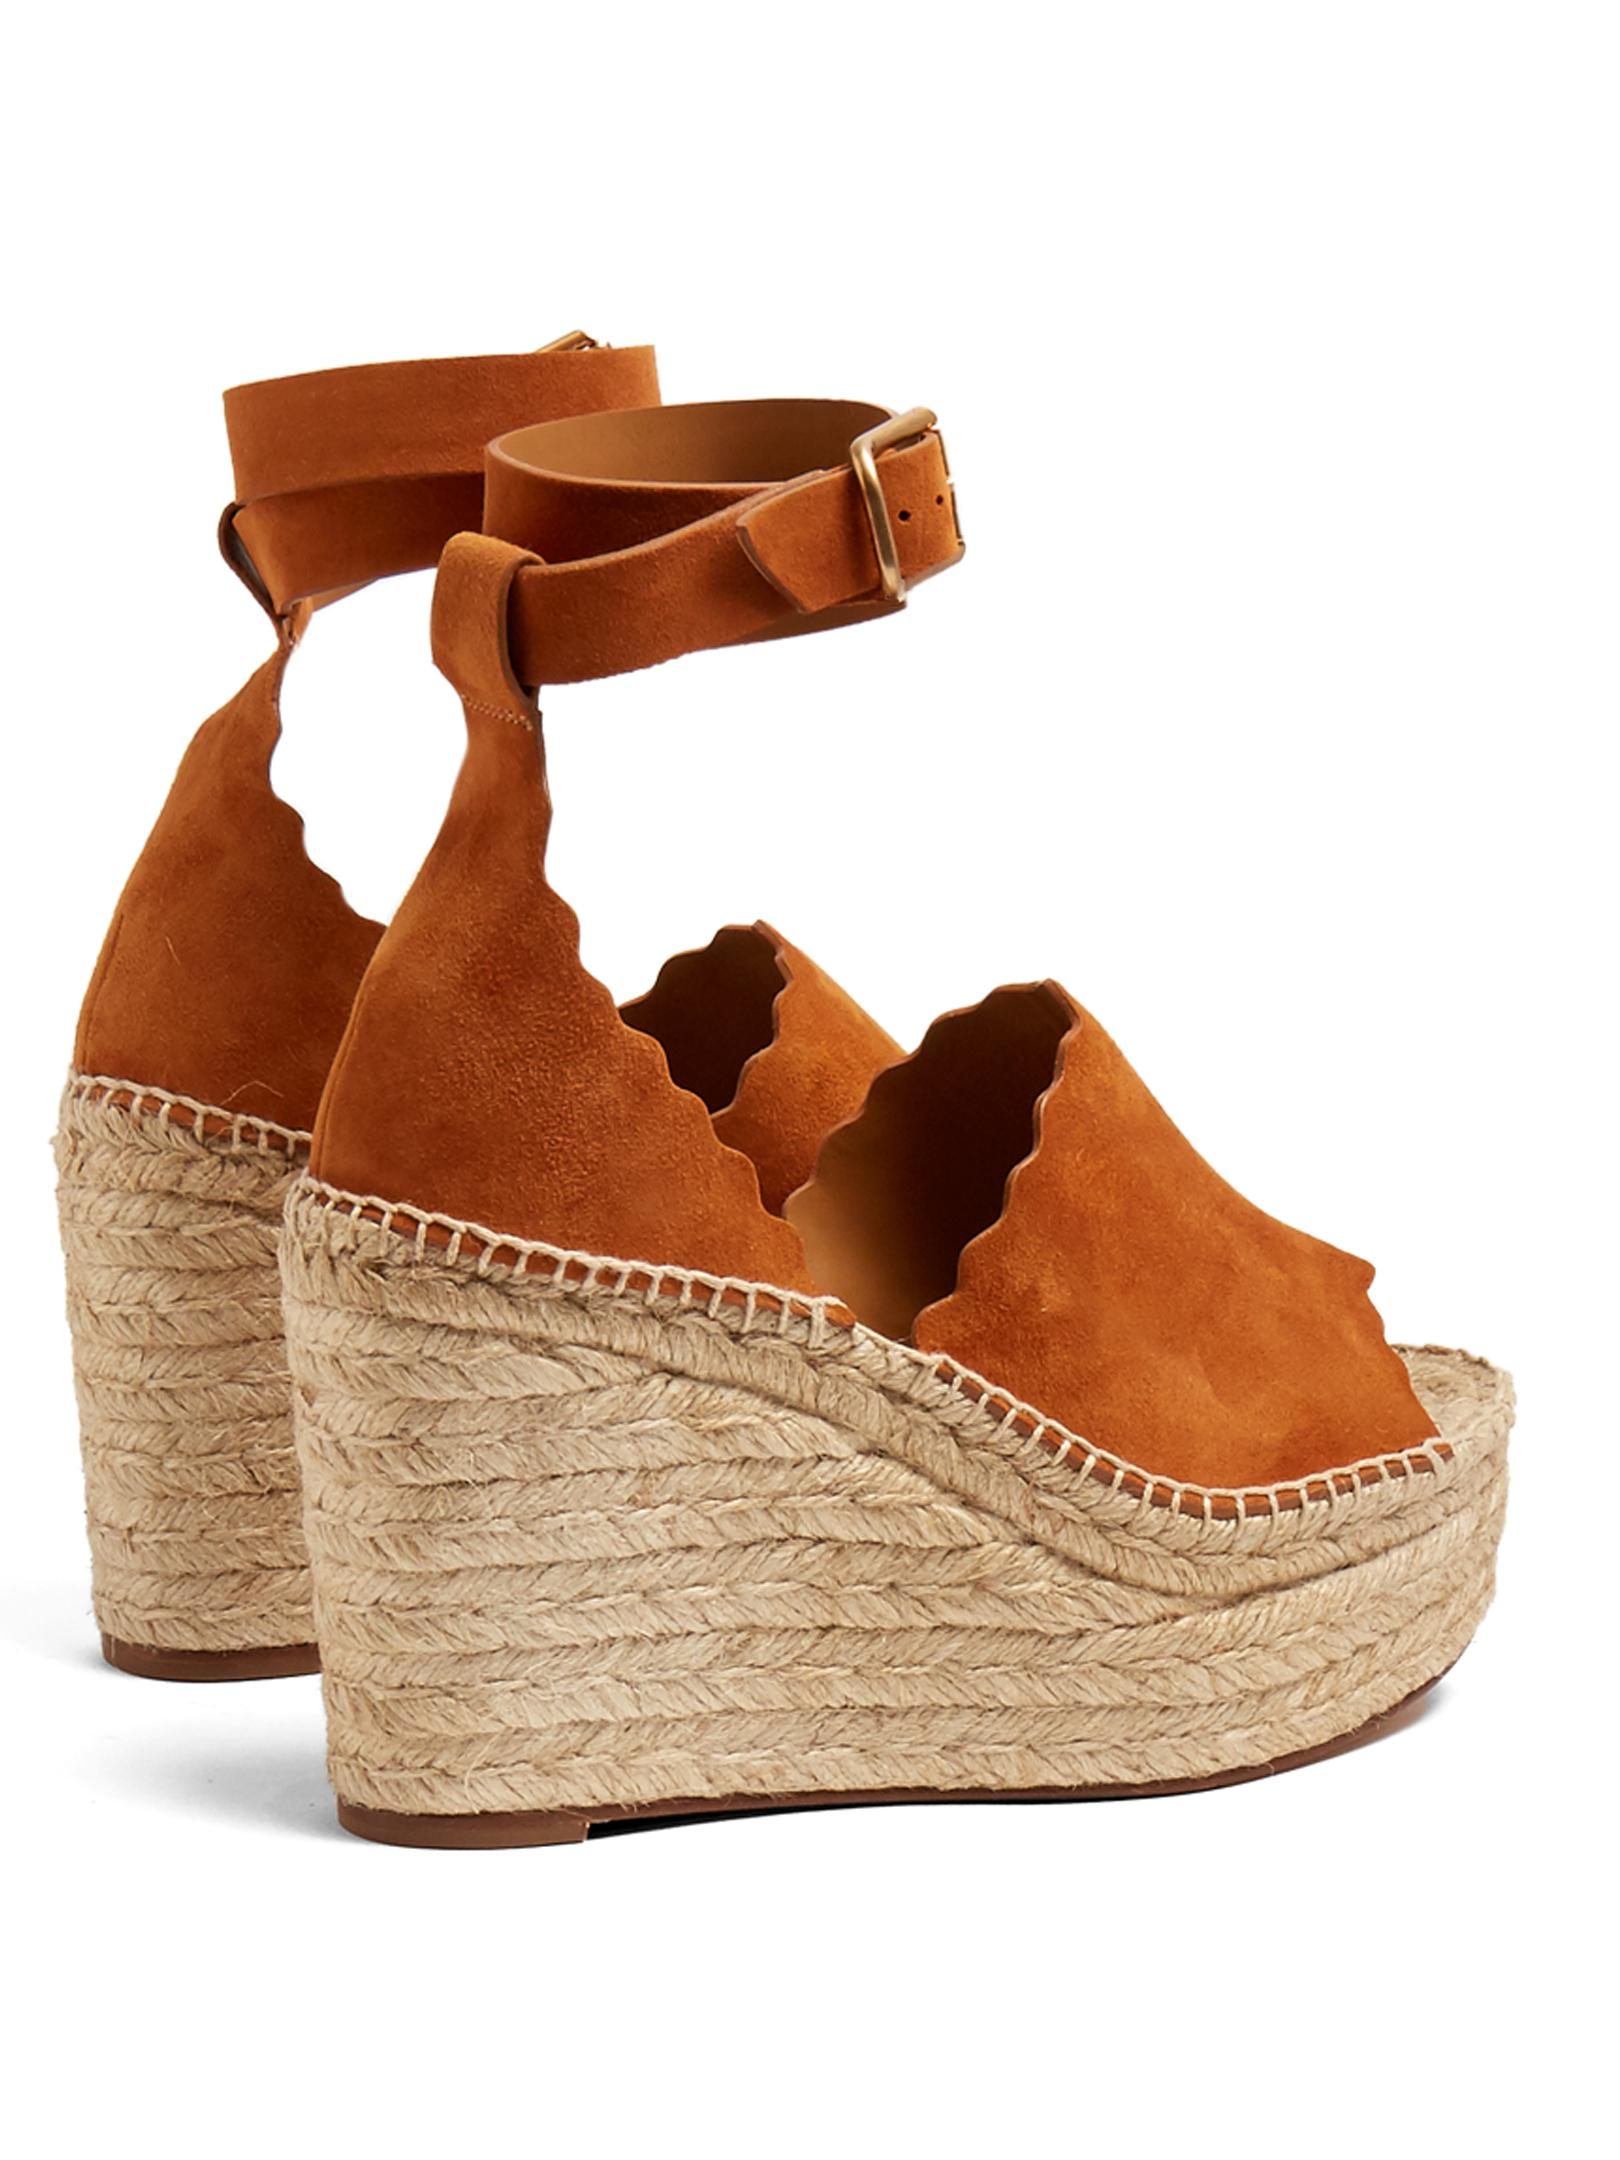 be16cfa2db Chloé Lauren Suede Espadrille Wedge Sandals in Brown - Lyst